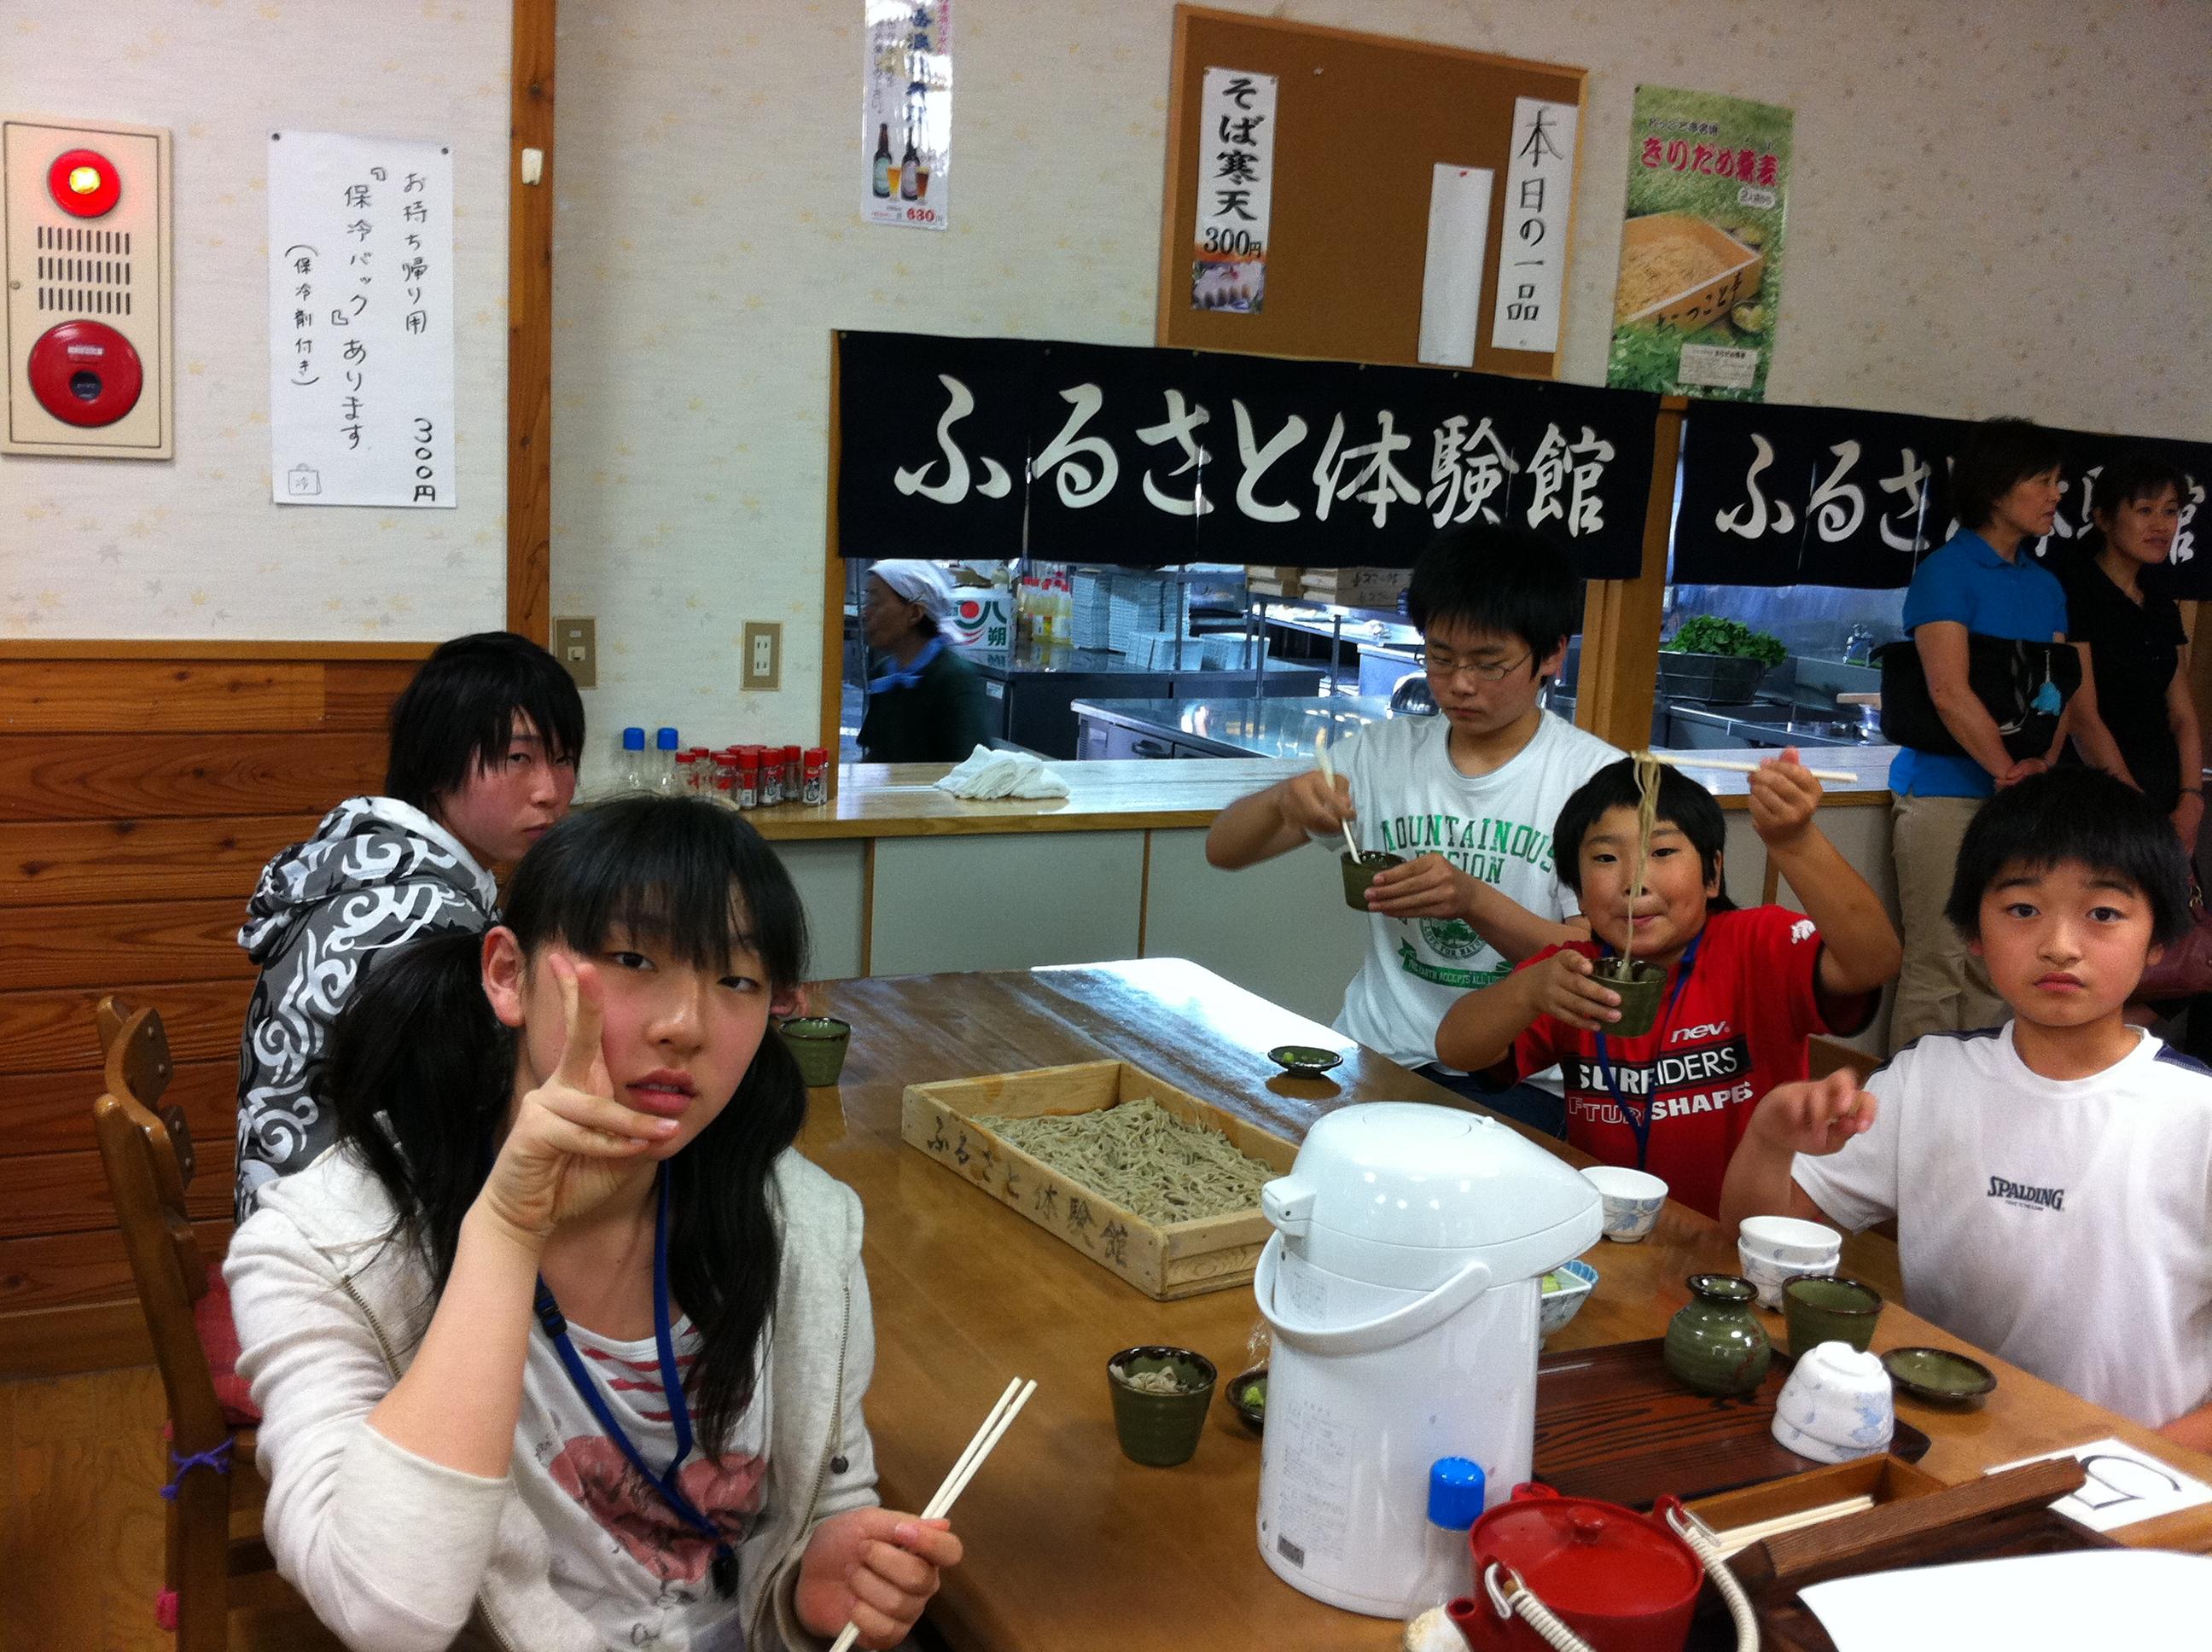 http://www.kodomonotsubasa.com/2011/07/29/0728soba25.JPG